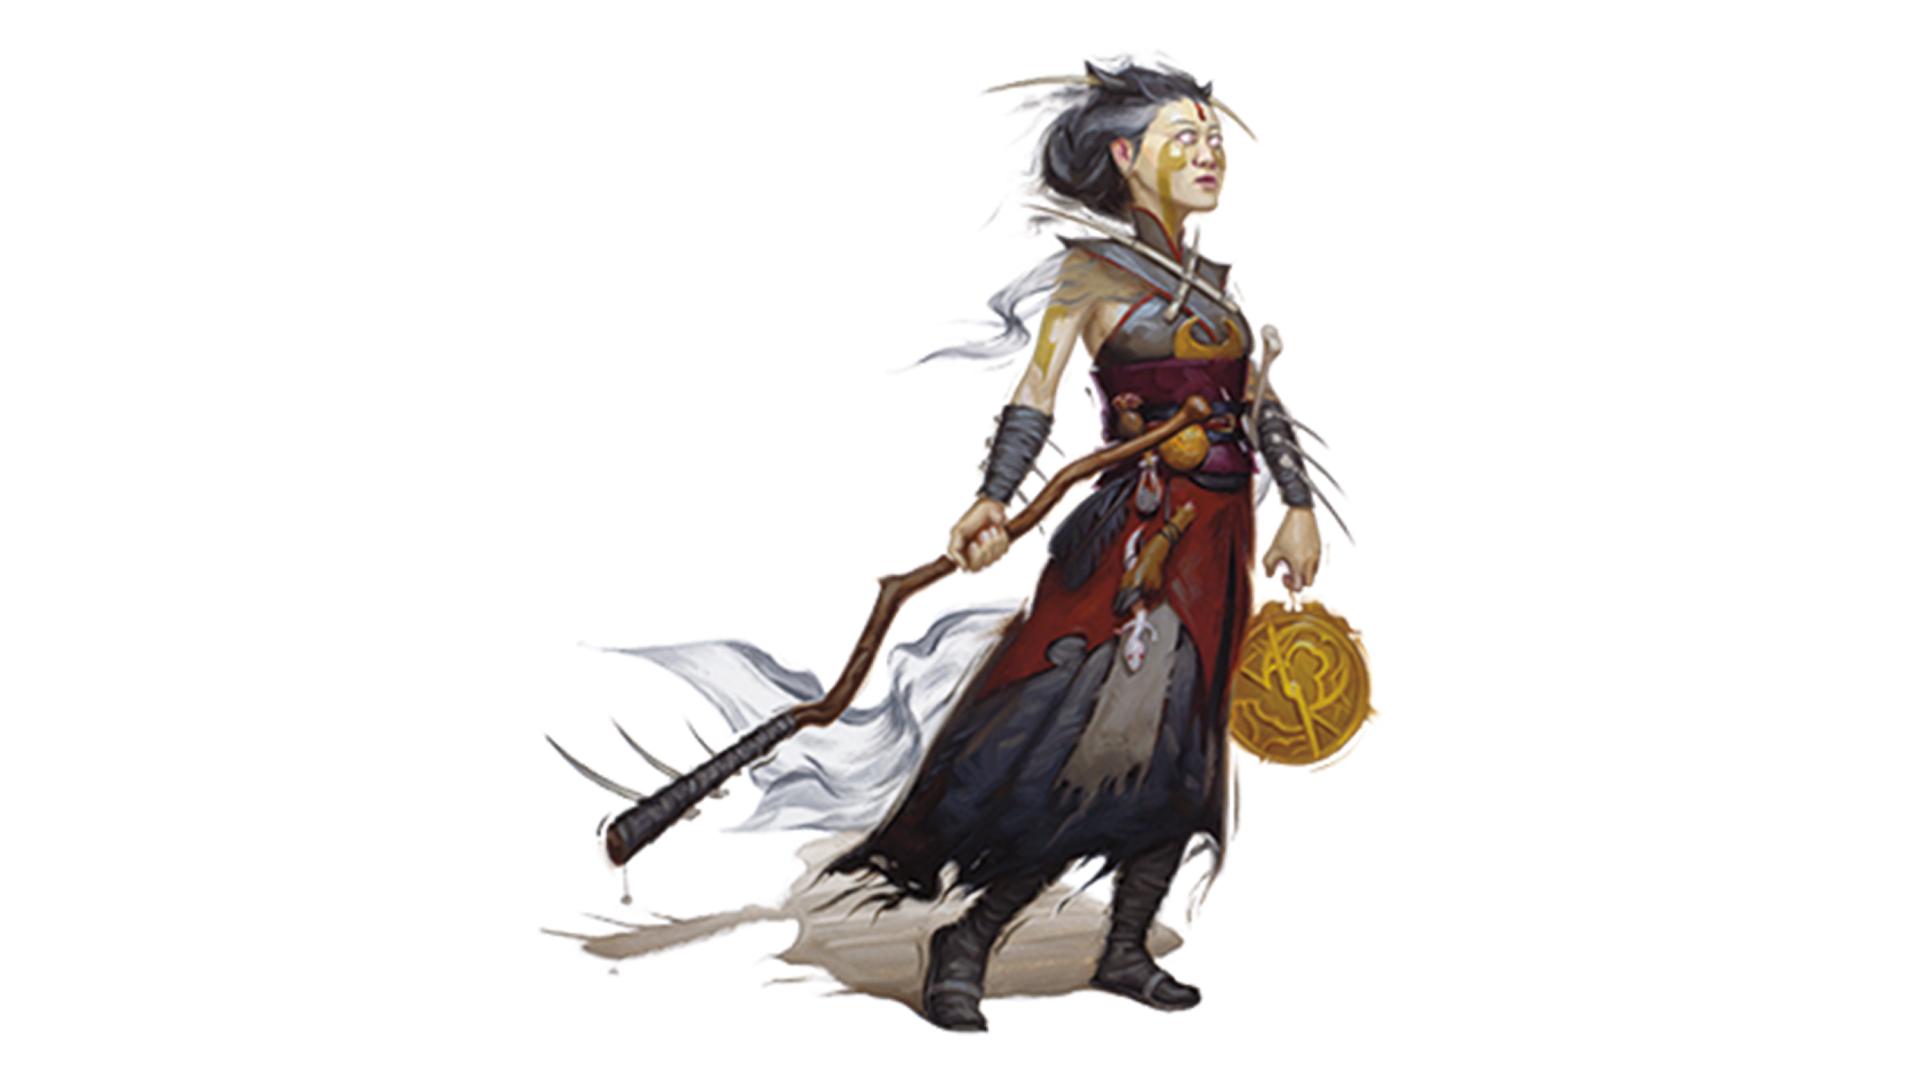 Dungeons & Dragons 5E warlock